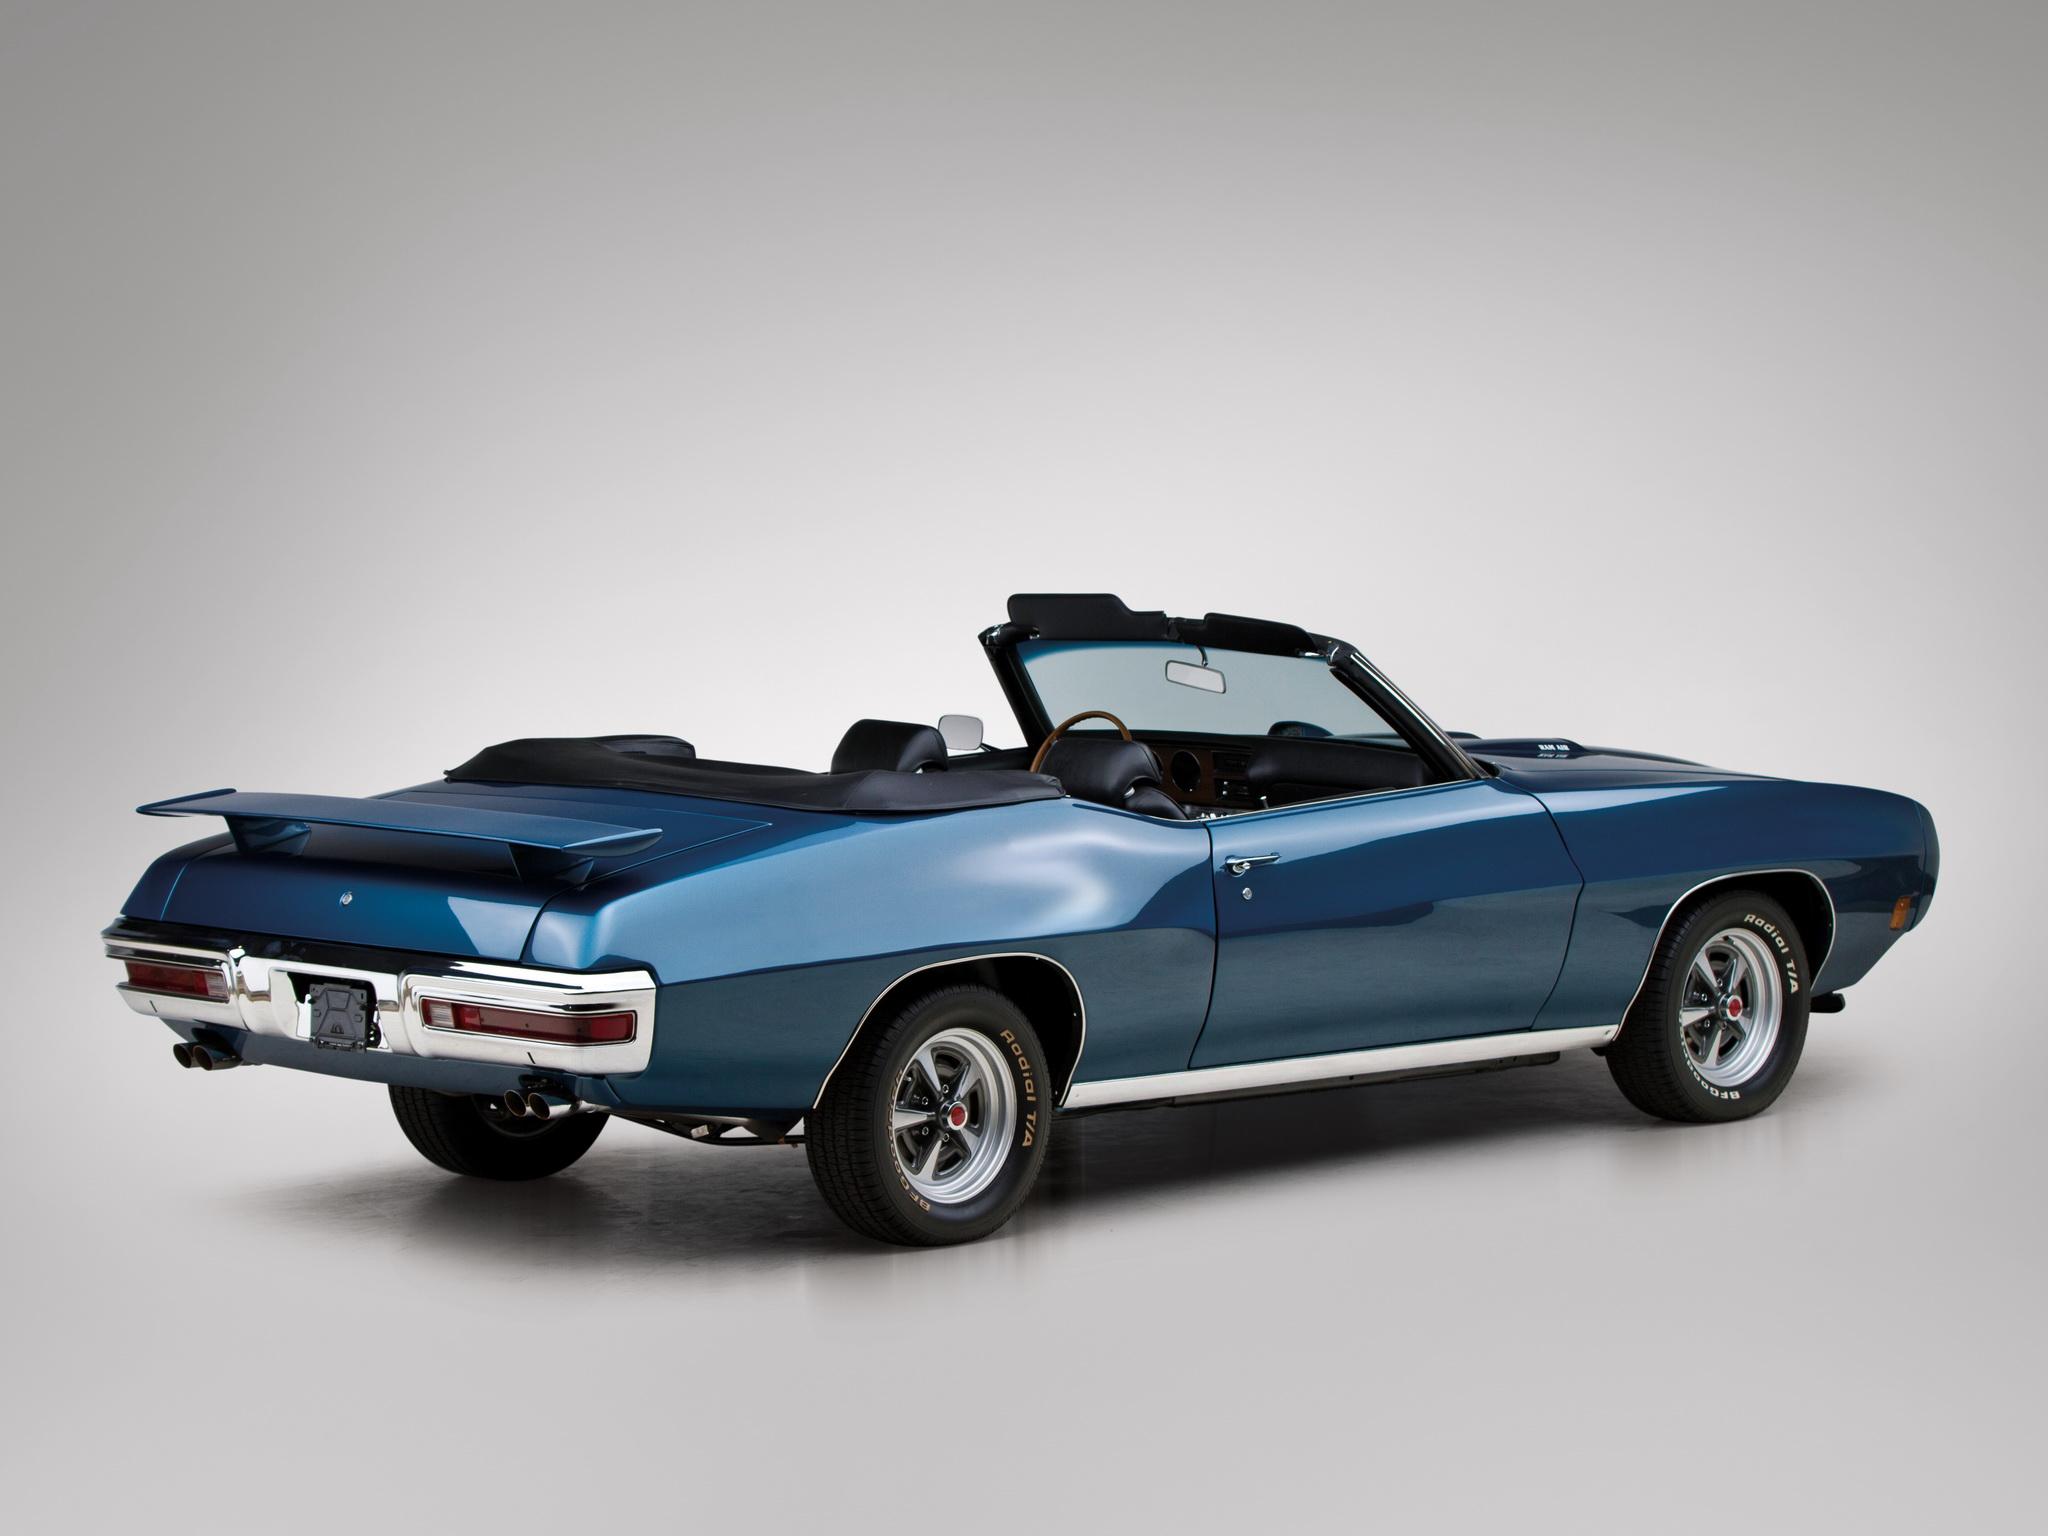 1970 Pontiac GTO Convertible 4267 muscle classic gg wallpaper 2048x1536